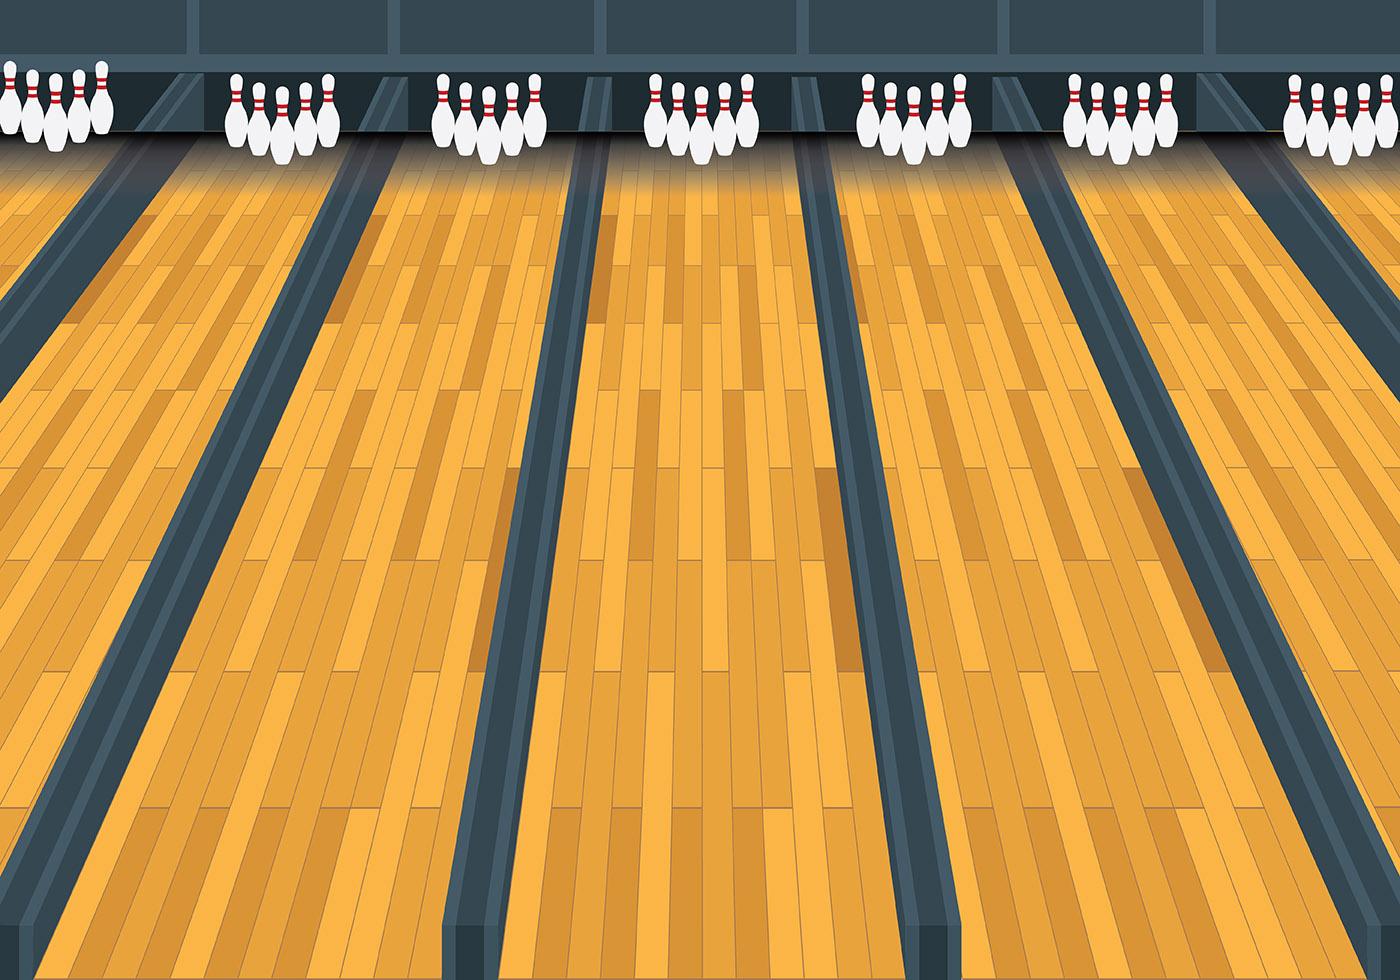 Bowling Lane Vector  Download Free Vector Art Stock